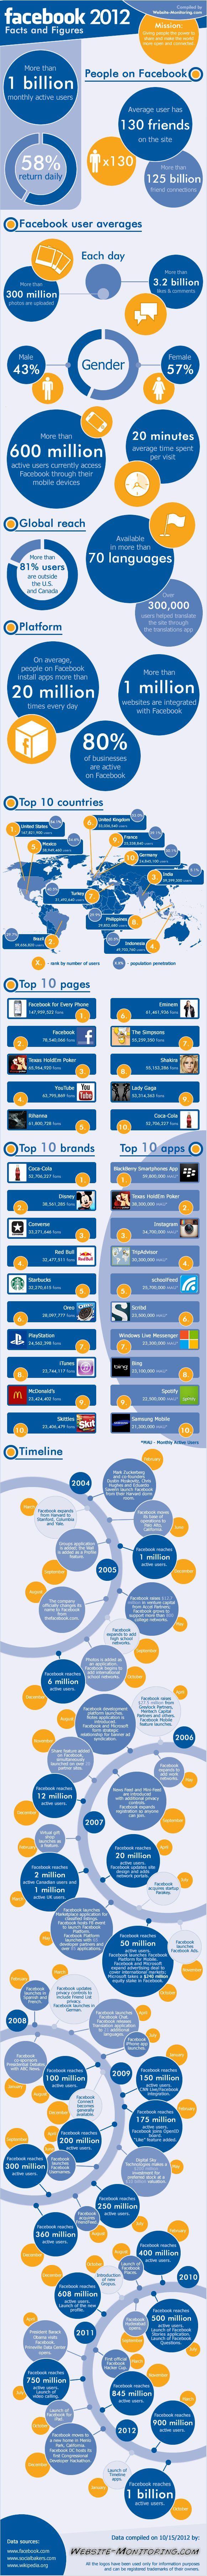 Datos relevantes sobre FaceBook en 2012